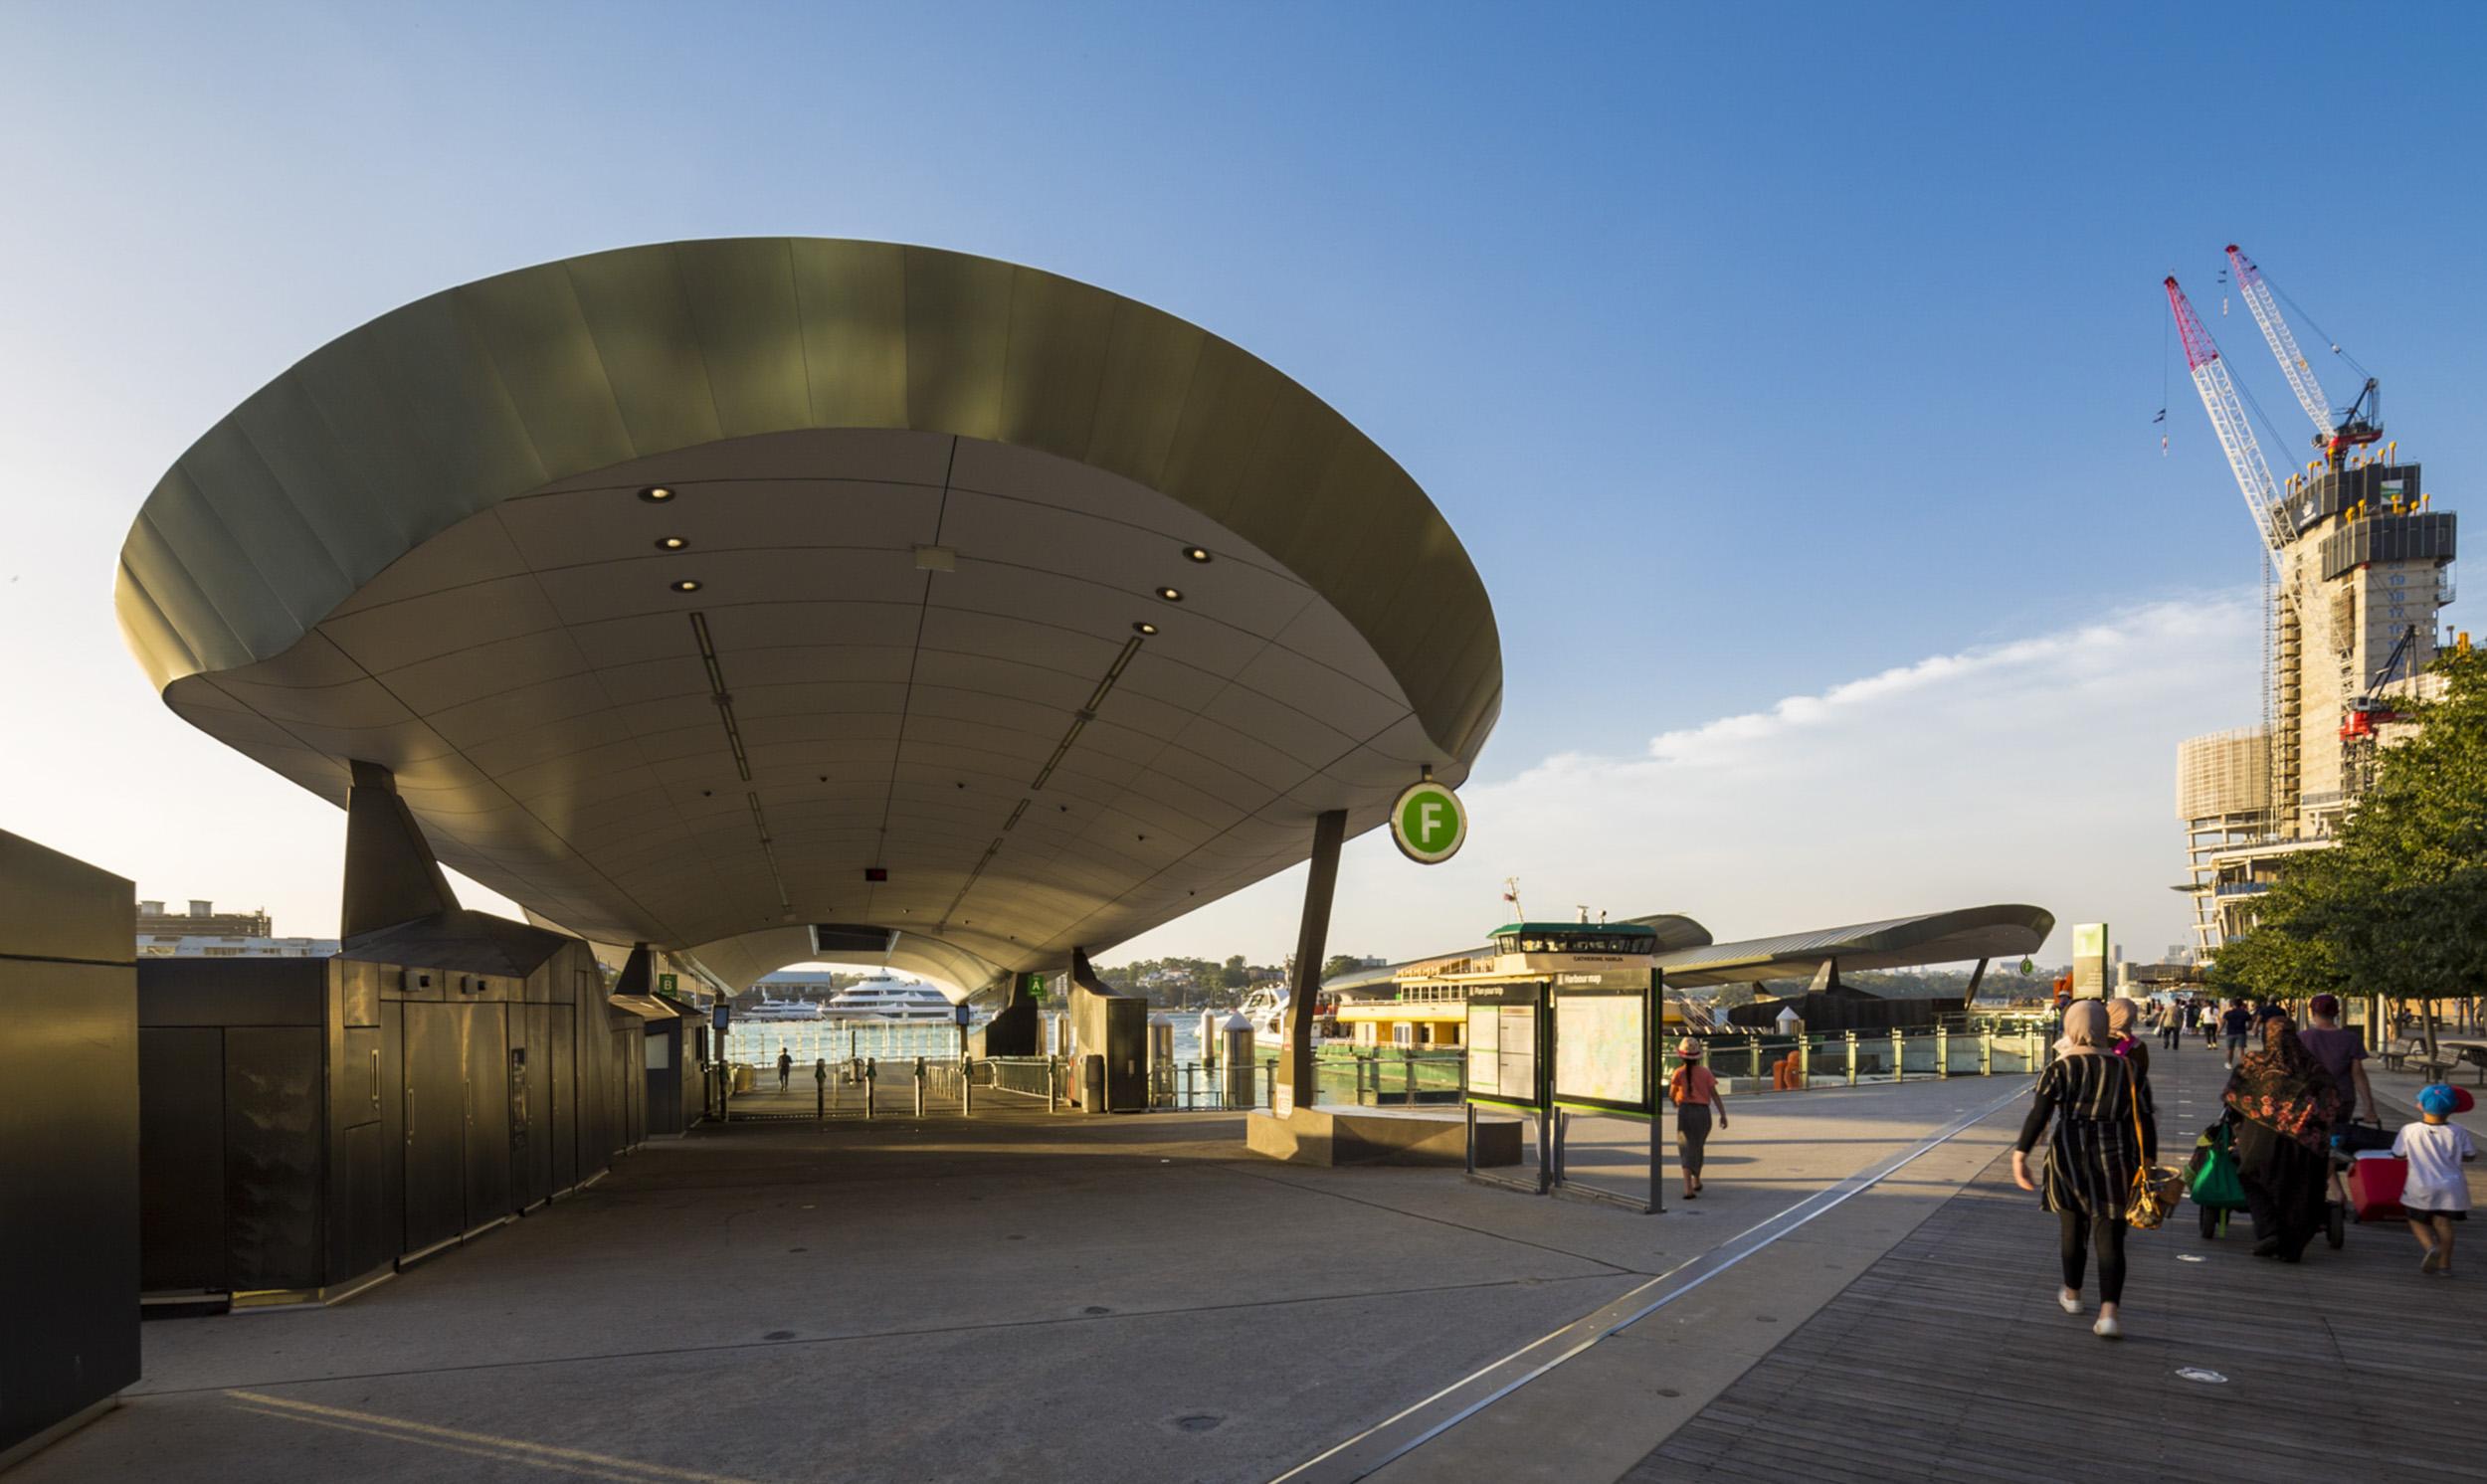 Barangaroo_wharf_cox_architecture_sydney_07.jpg